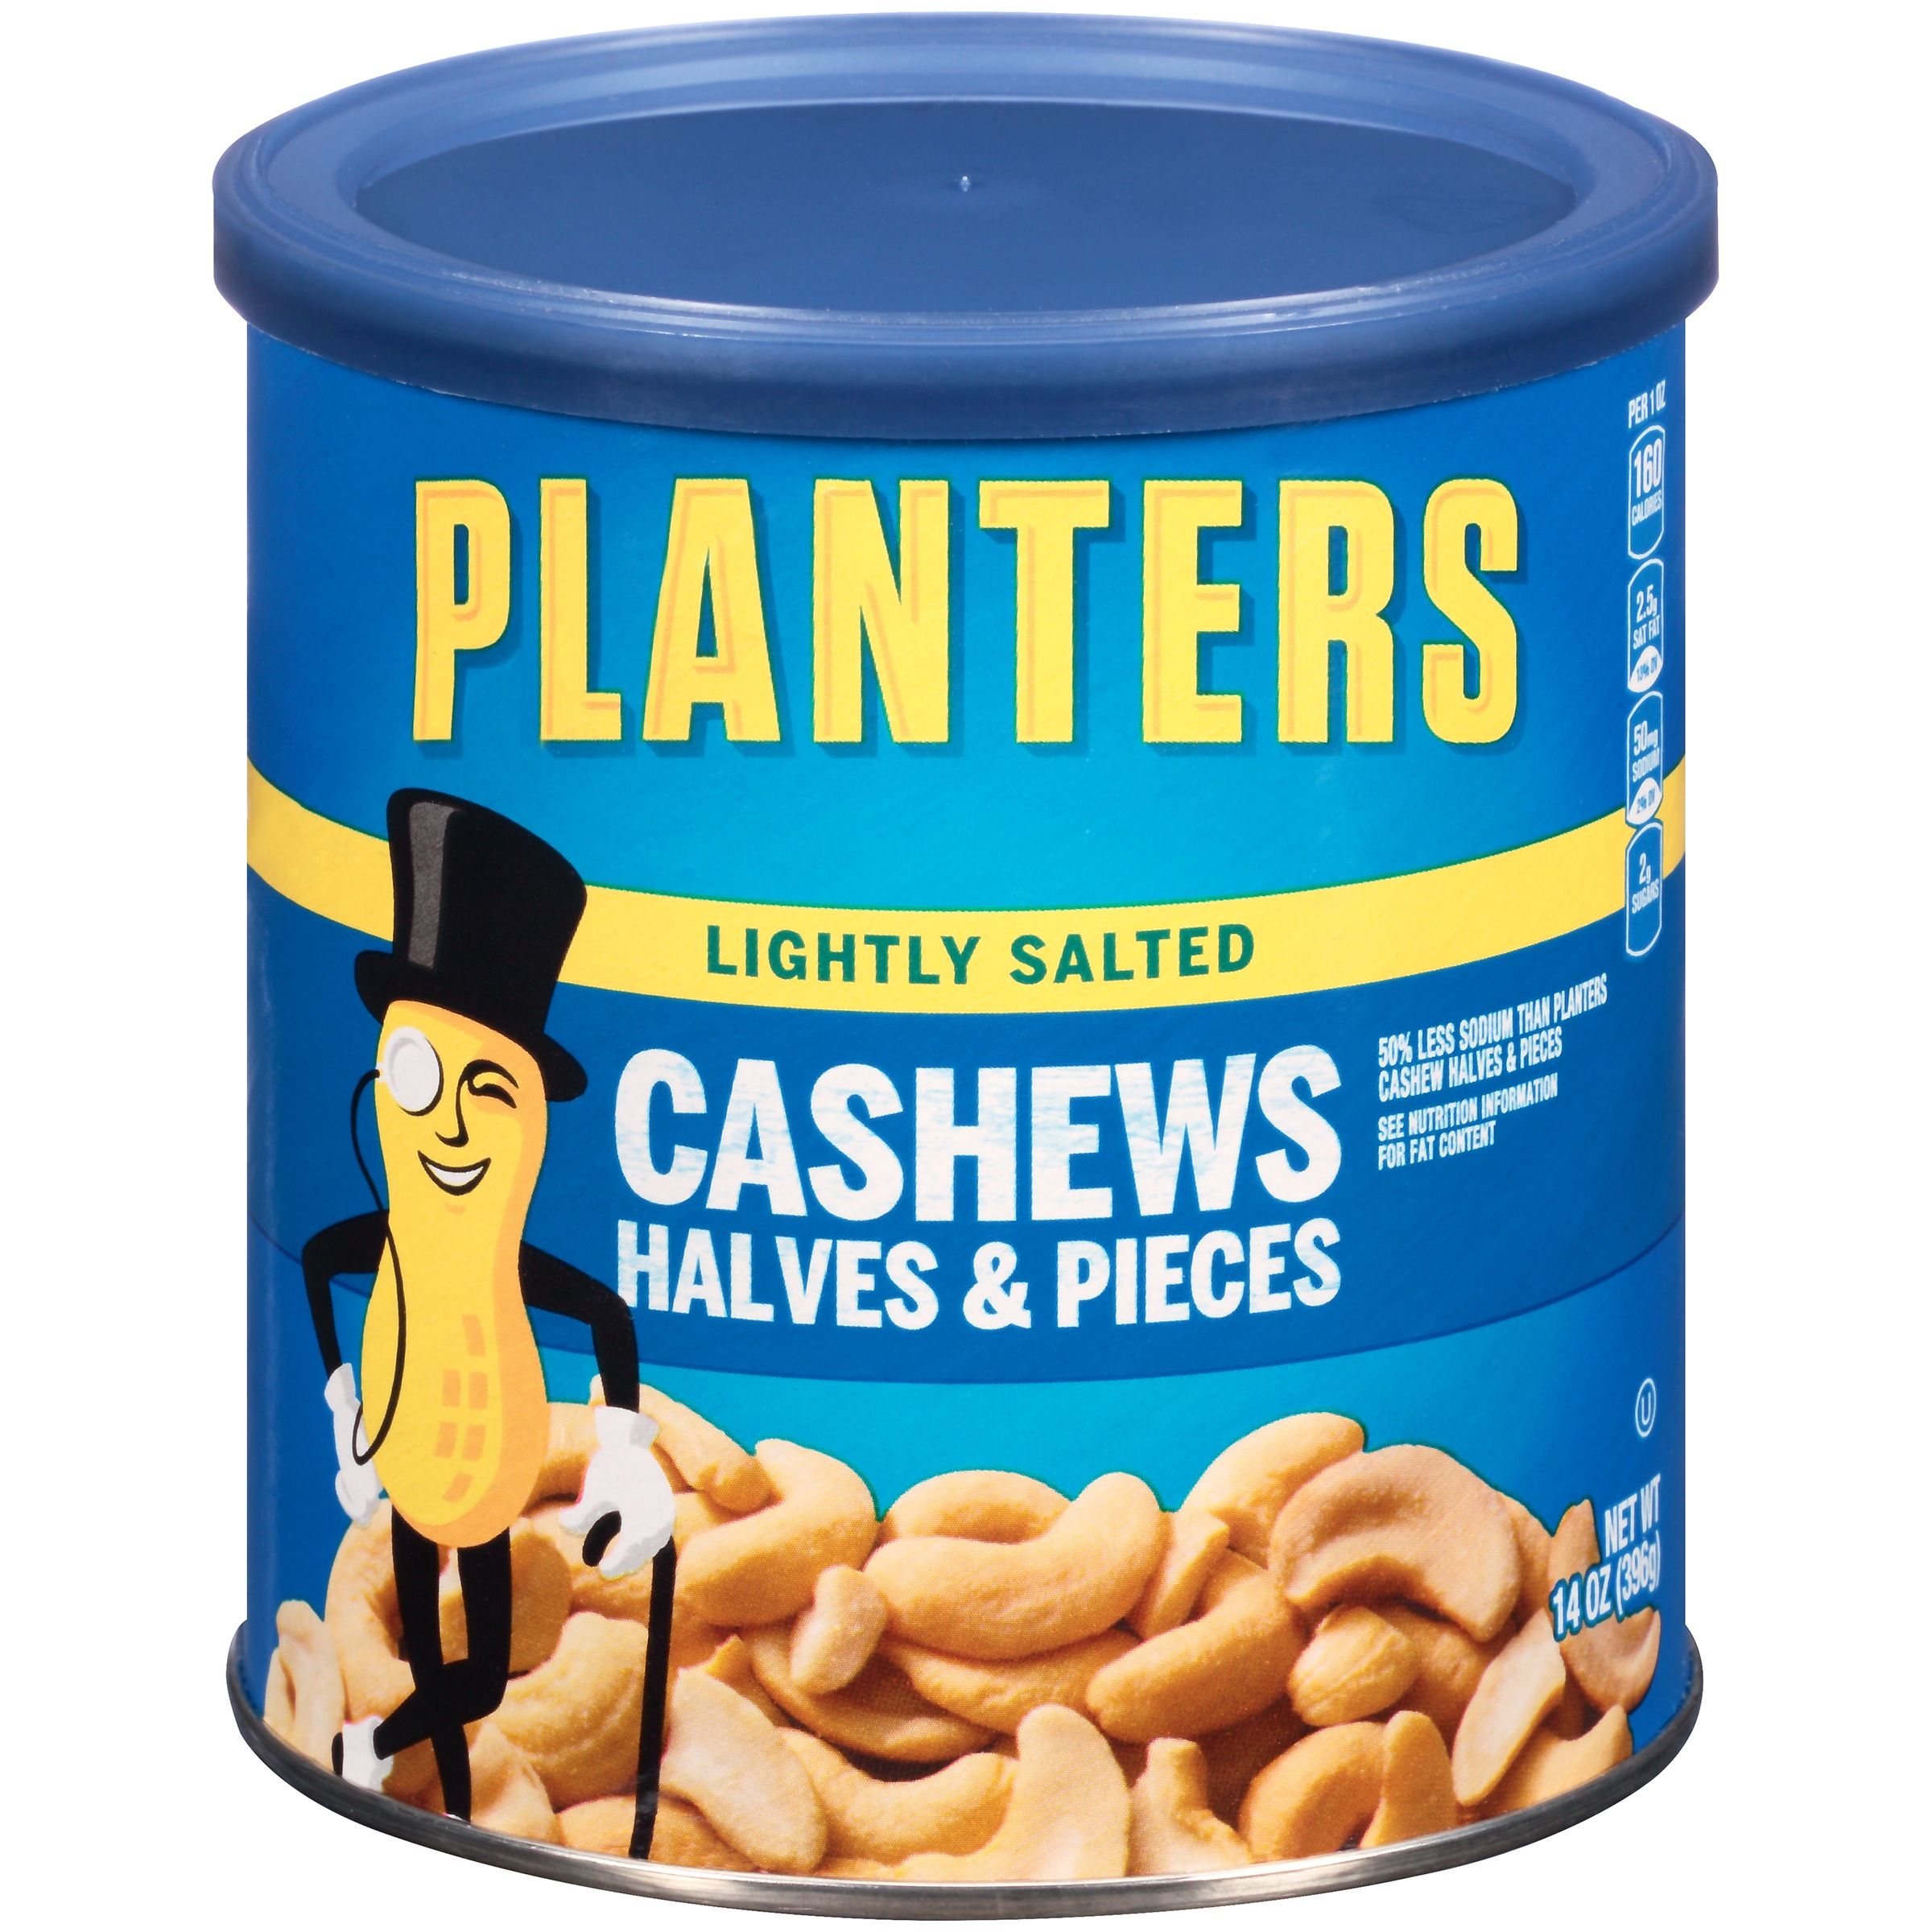 Planters Lightly Salted Cashew Halves & Pieces, 14 Oz.